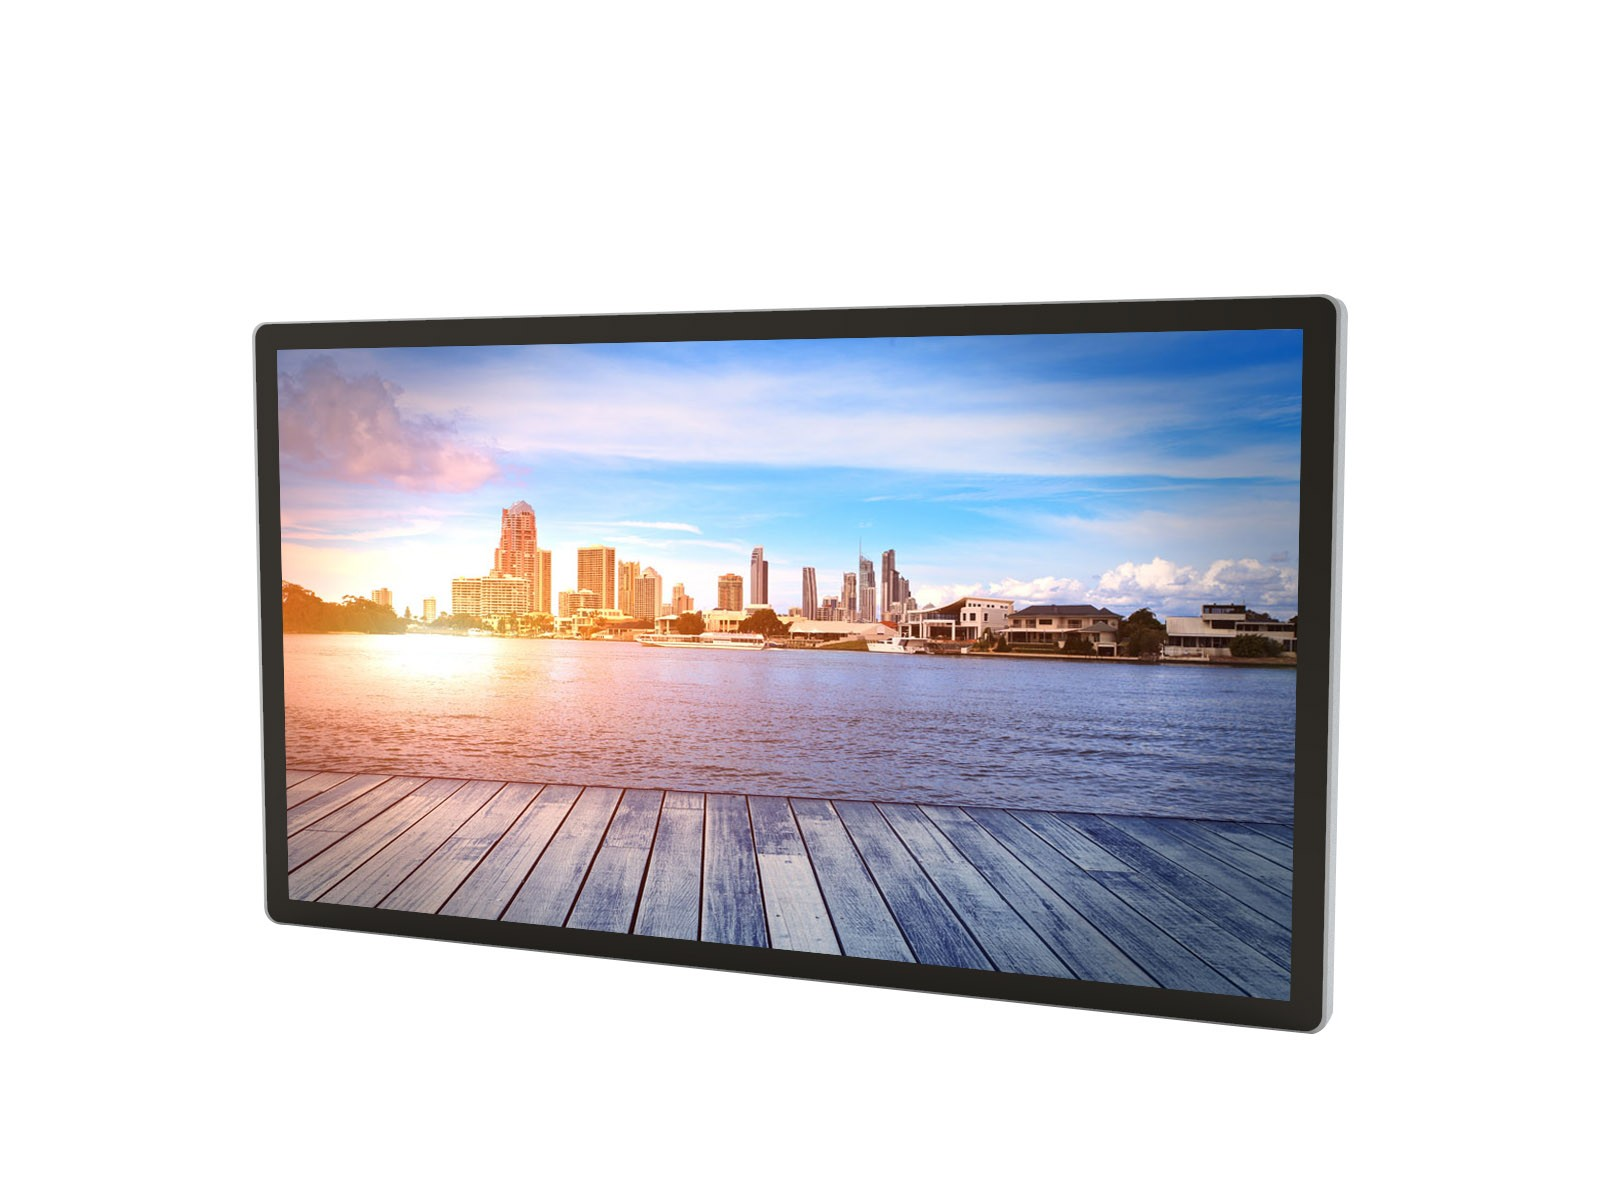 MG-GB550 Wall-mounted Digital Signage